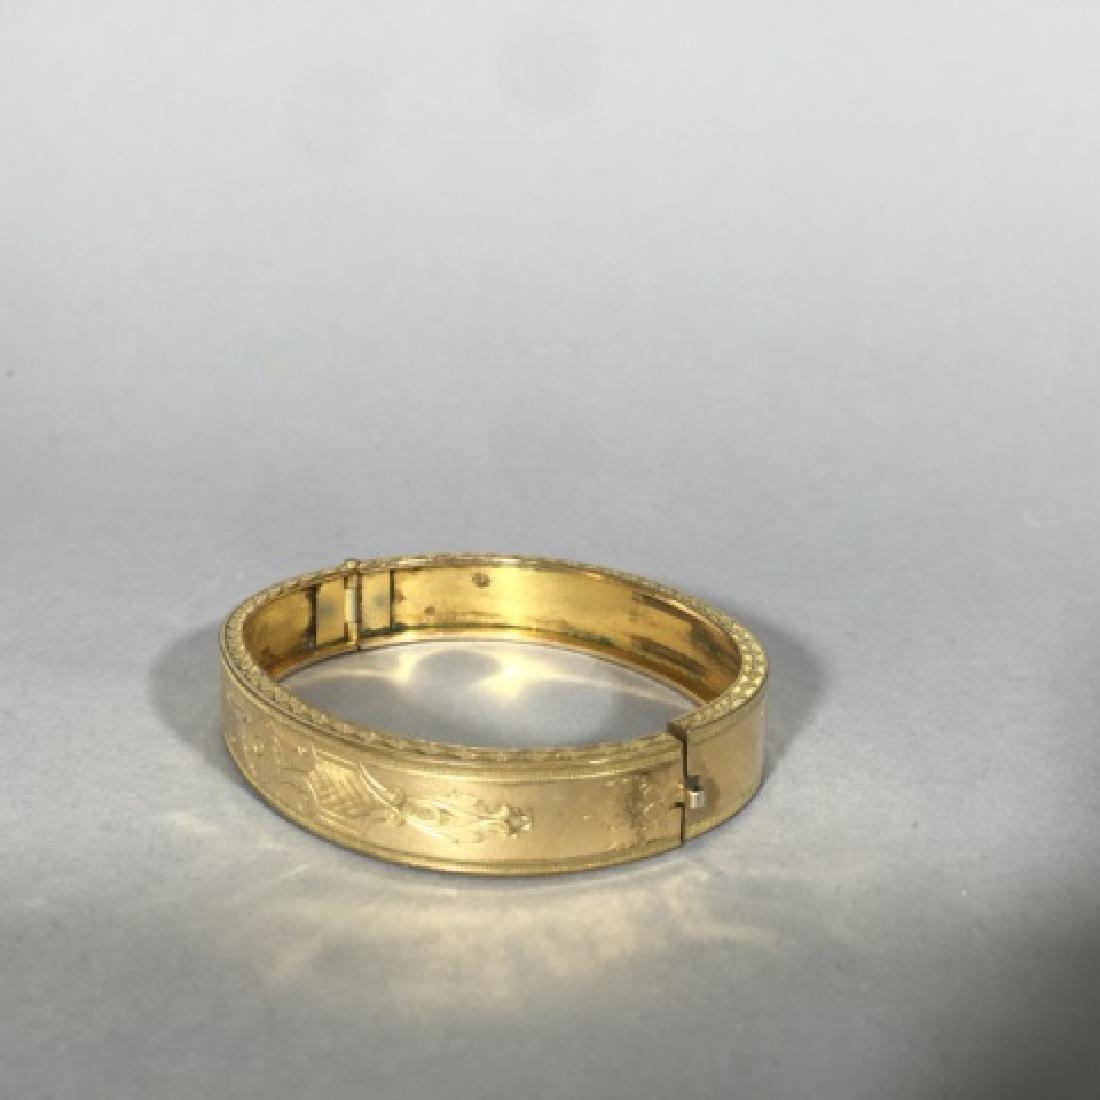 Antique 19th C Victorian Gold Bangle Bracelet - 5